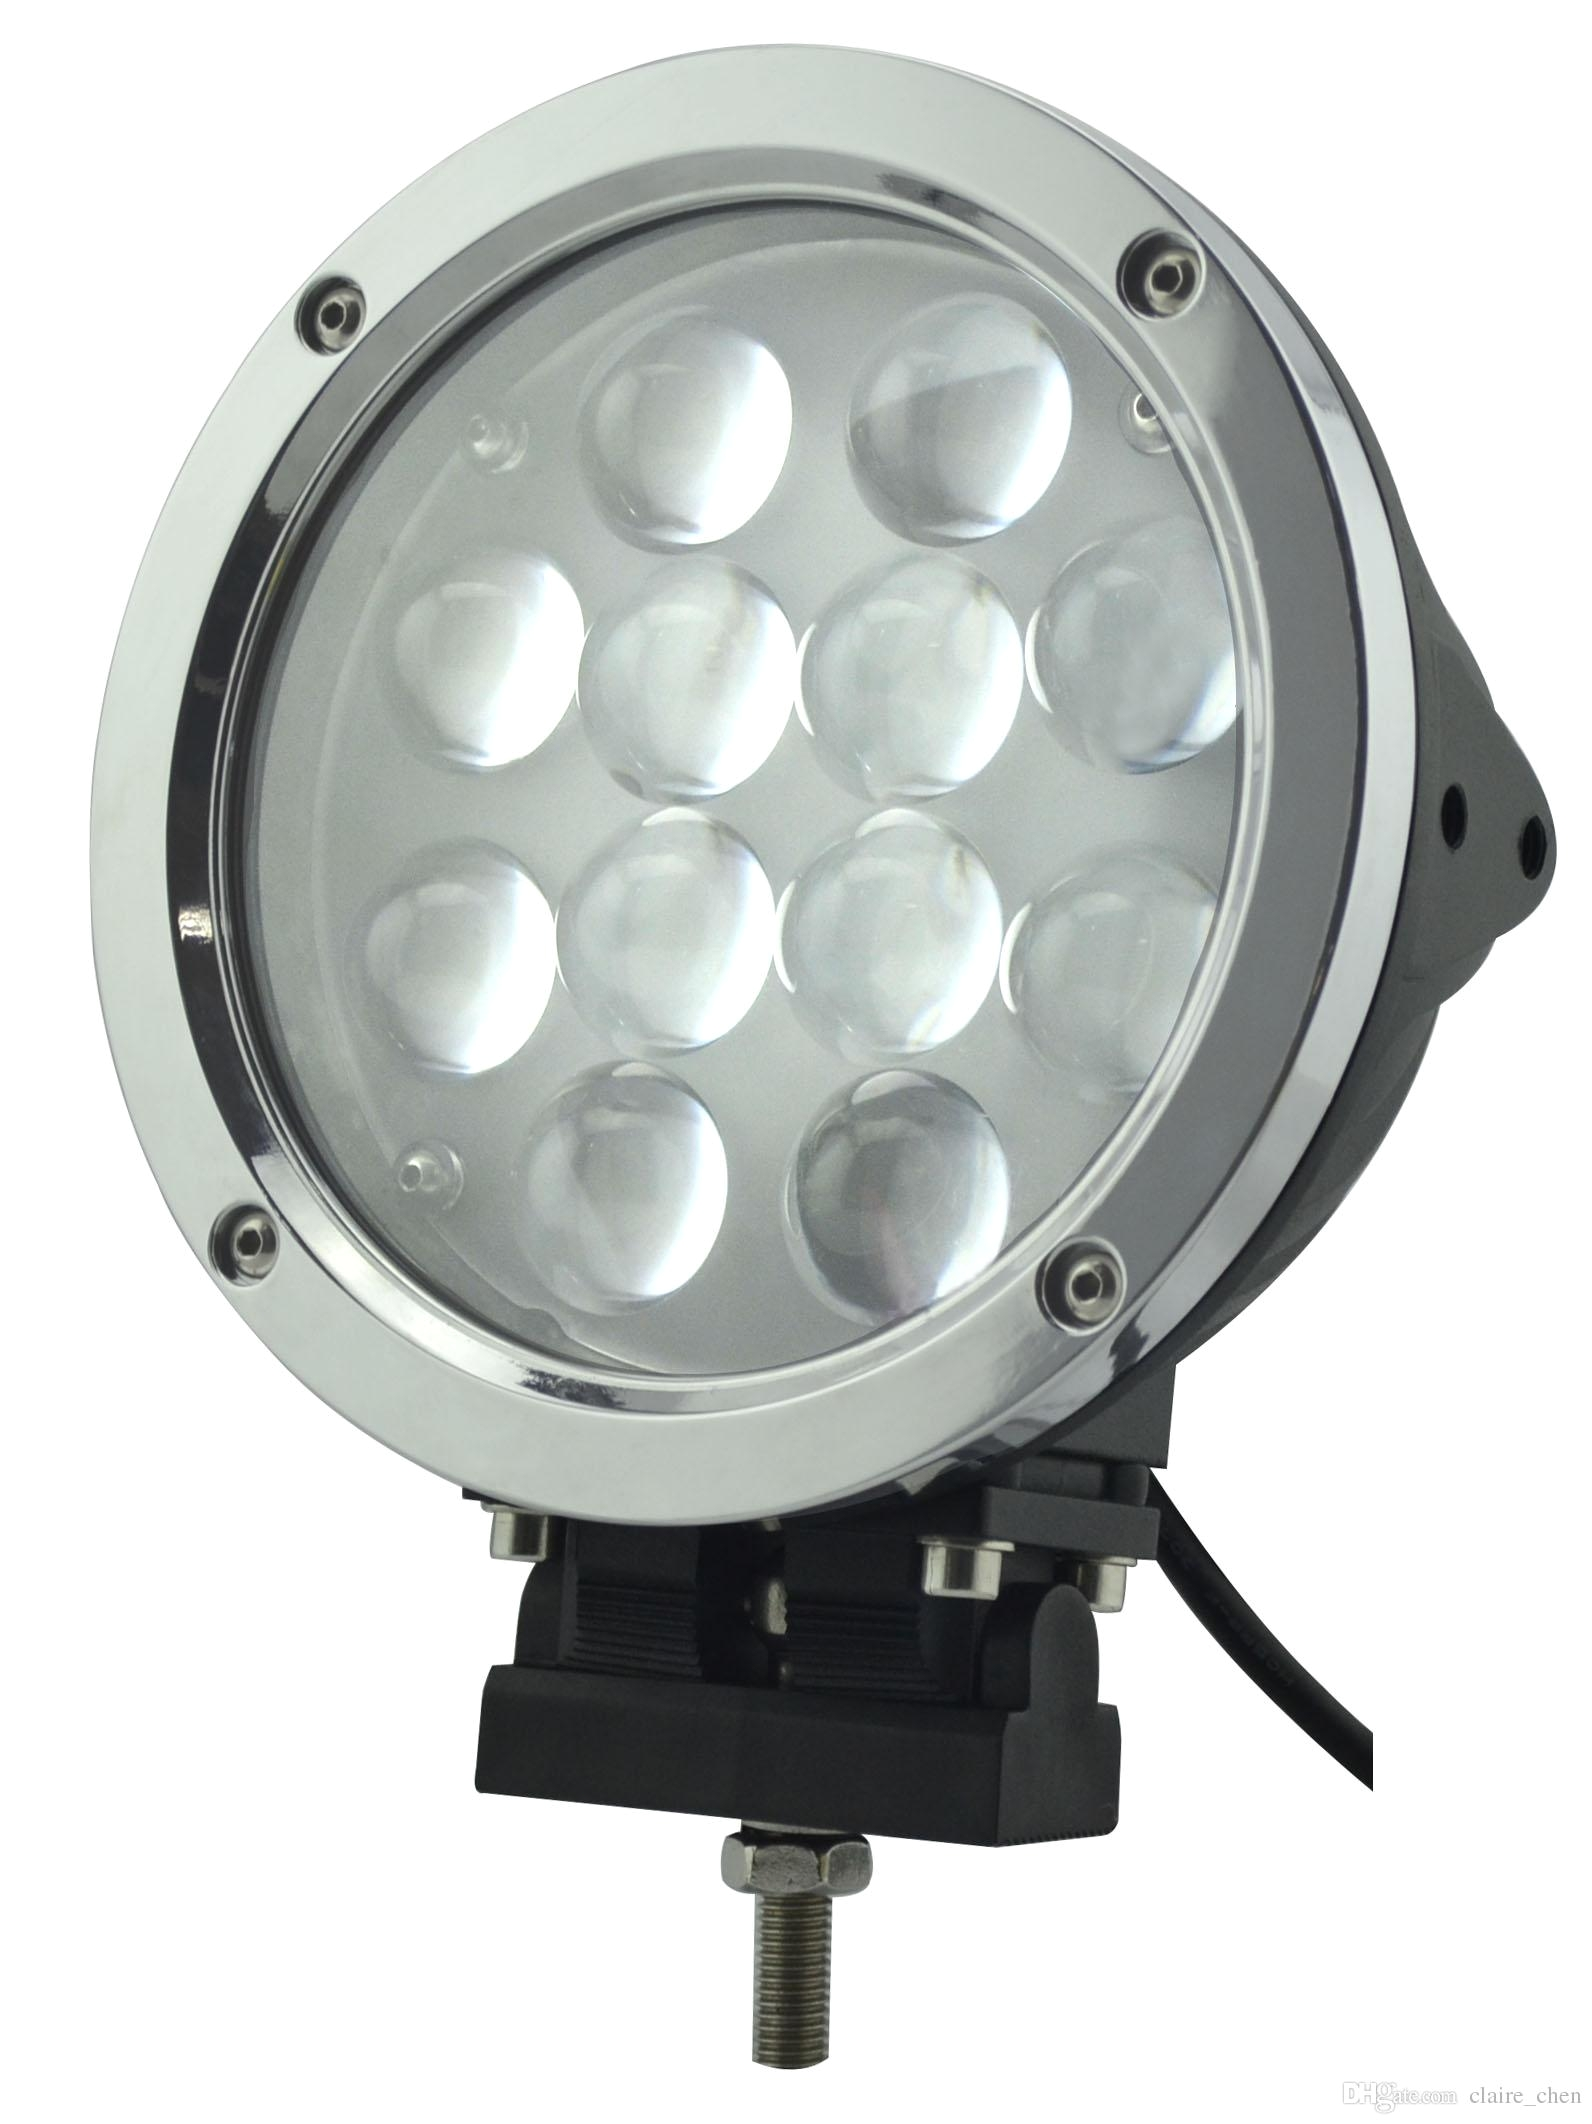 7 round 60w cree led driving light off road work light bar modular fog